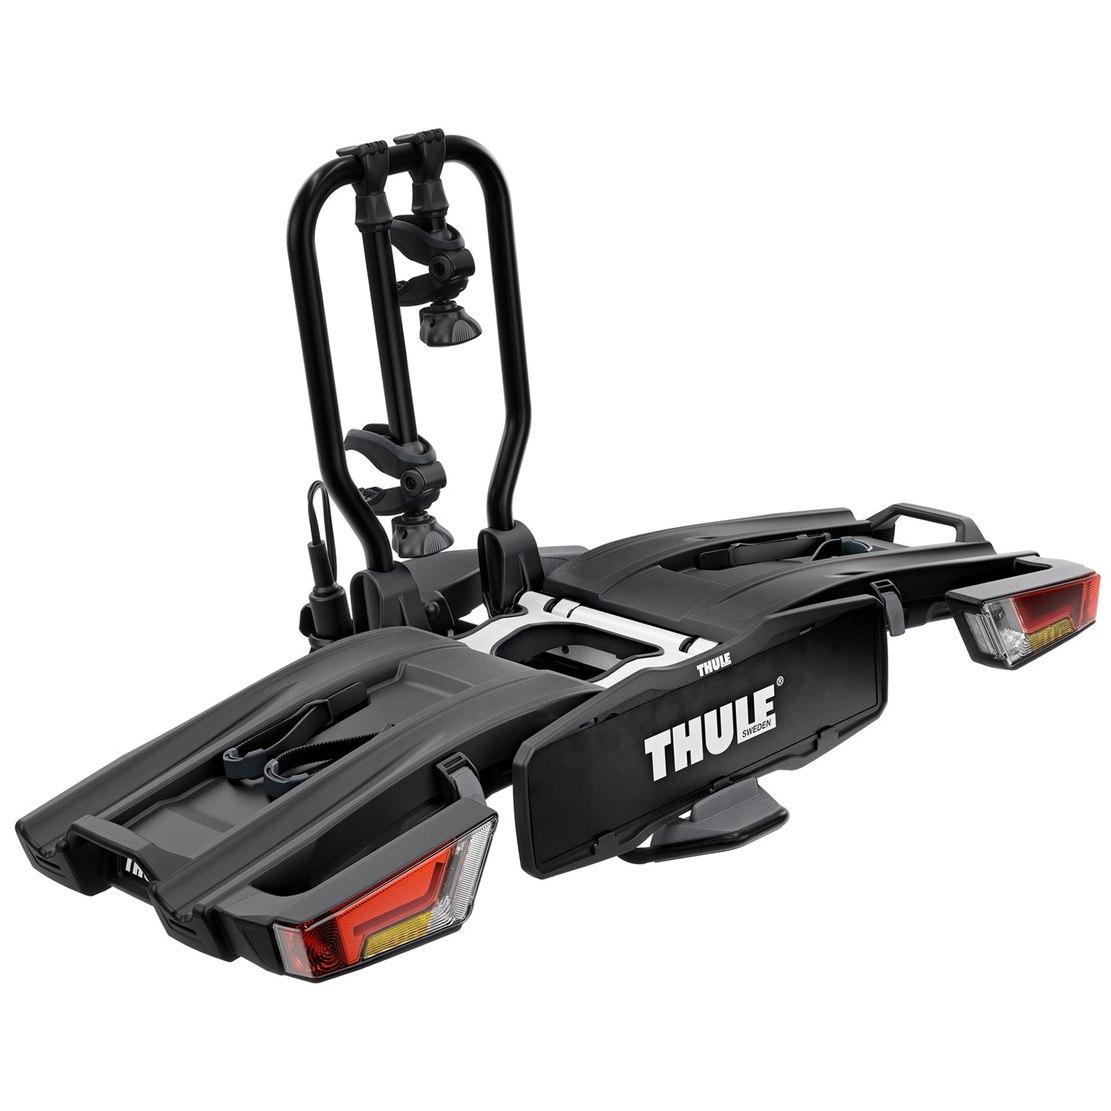 Thule EasyFold XT 2 Bike Rack for two Bikes - Black